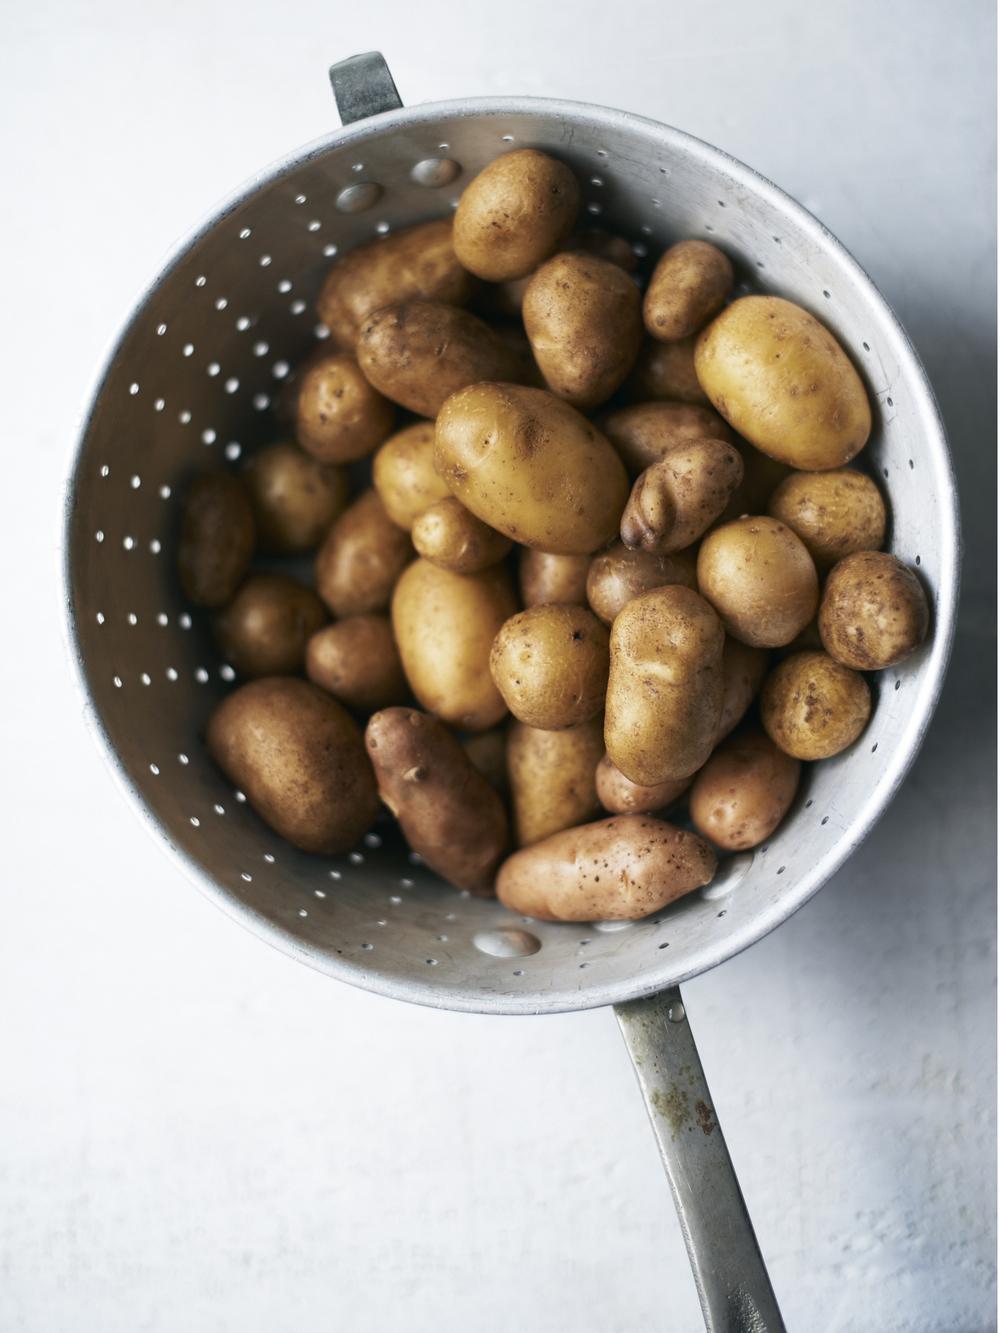 Potato_Test 2947.jpg